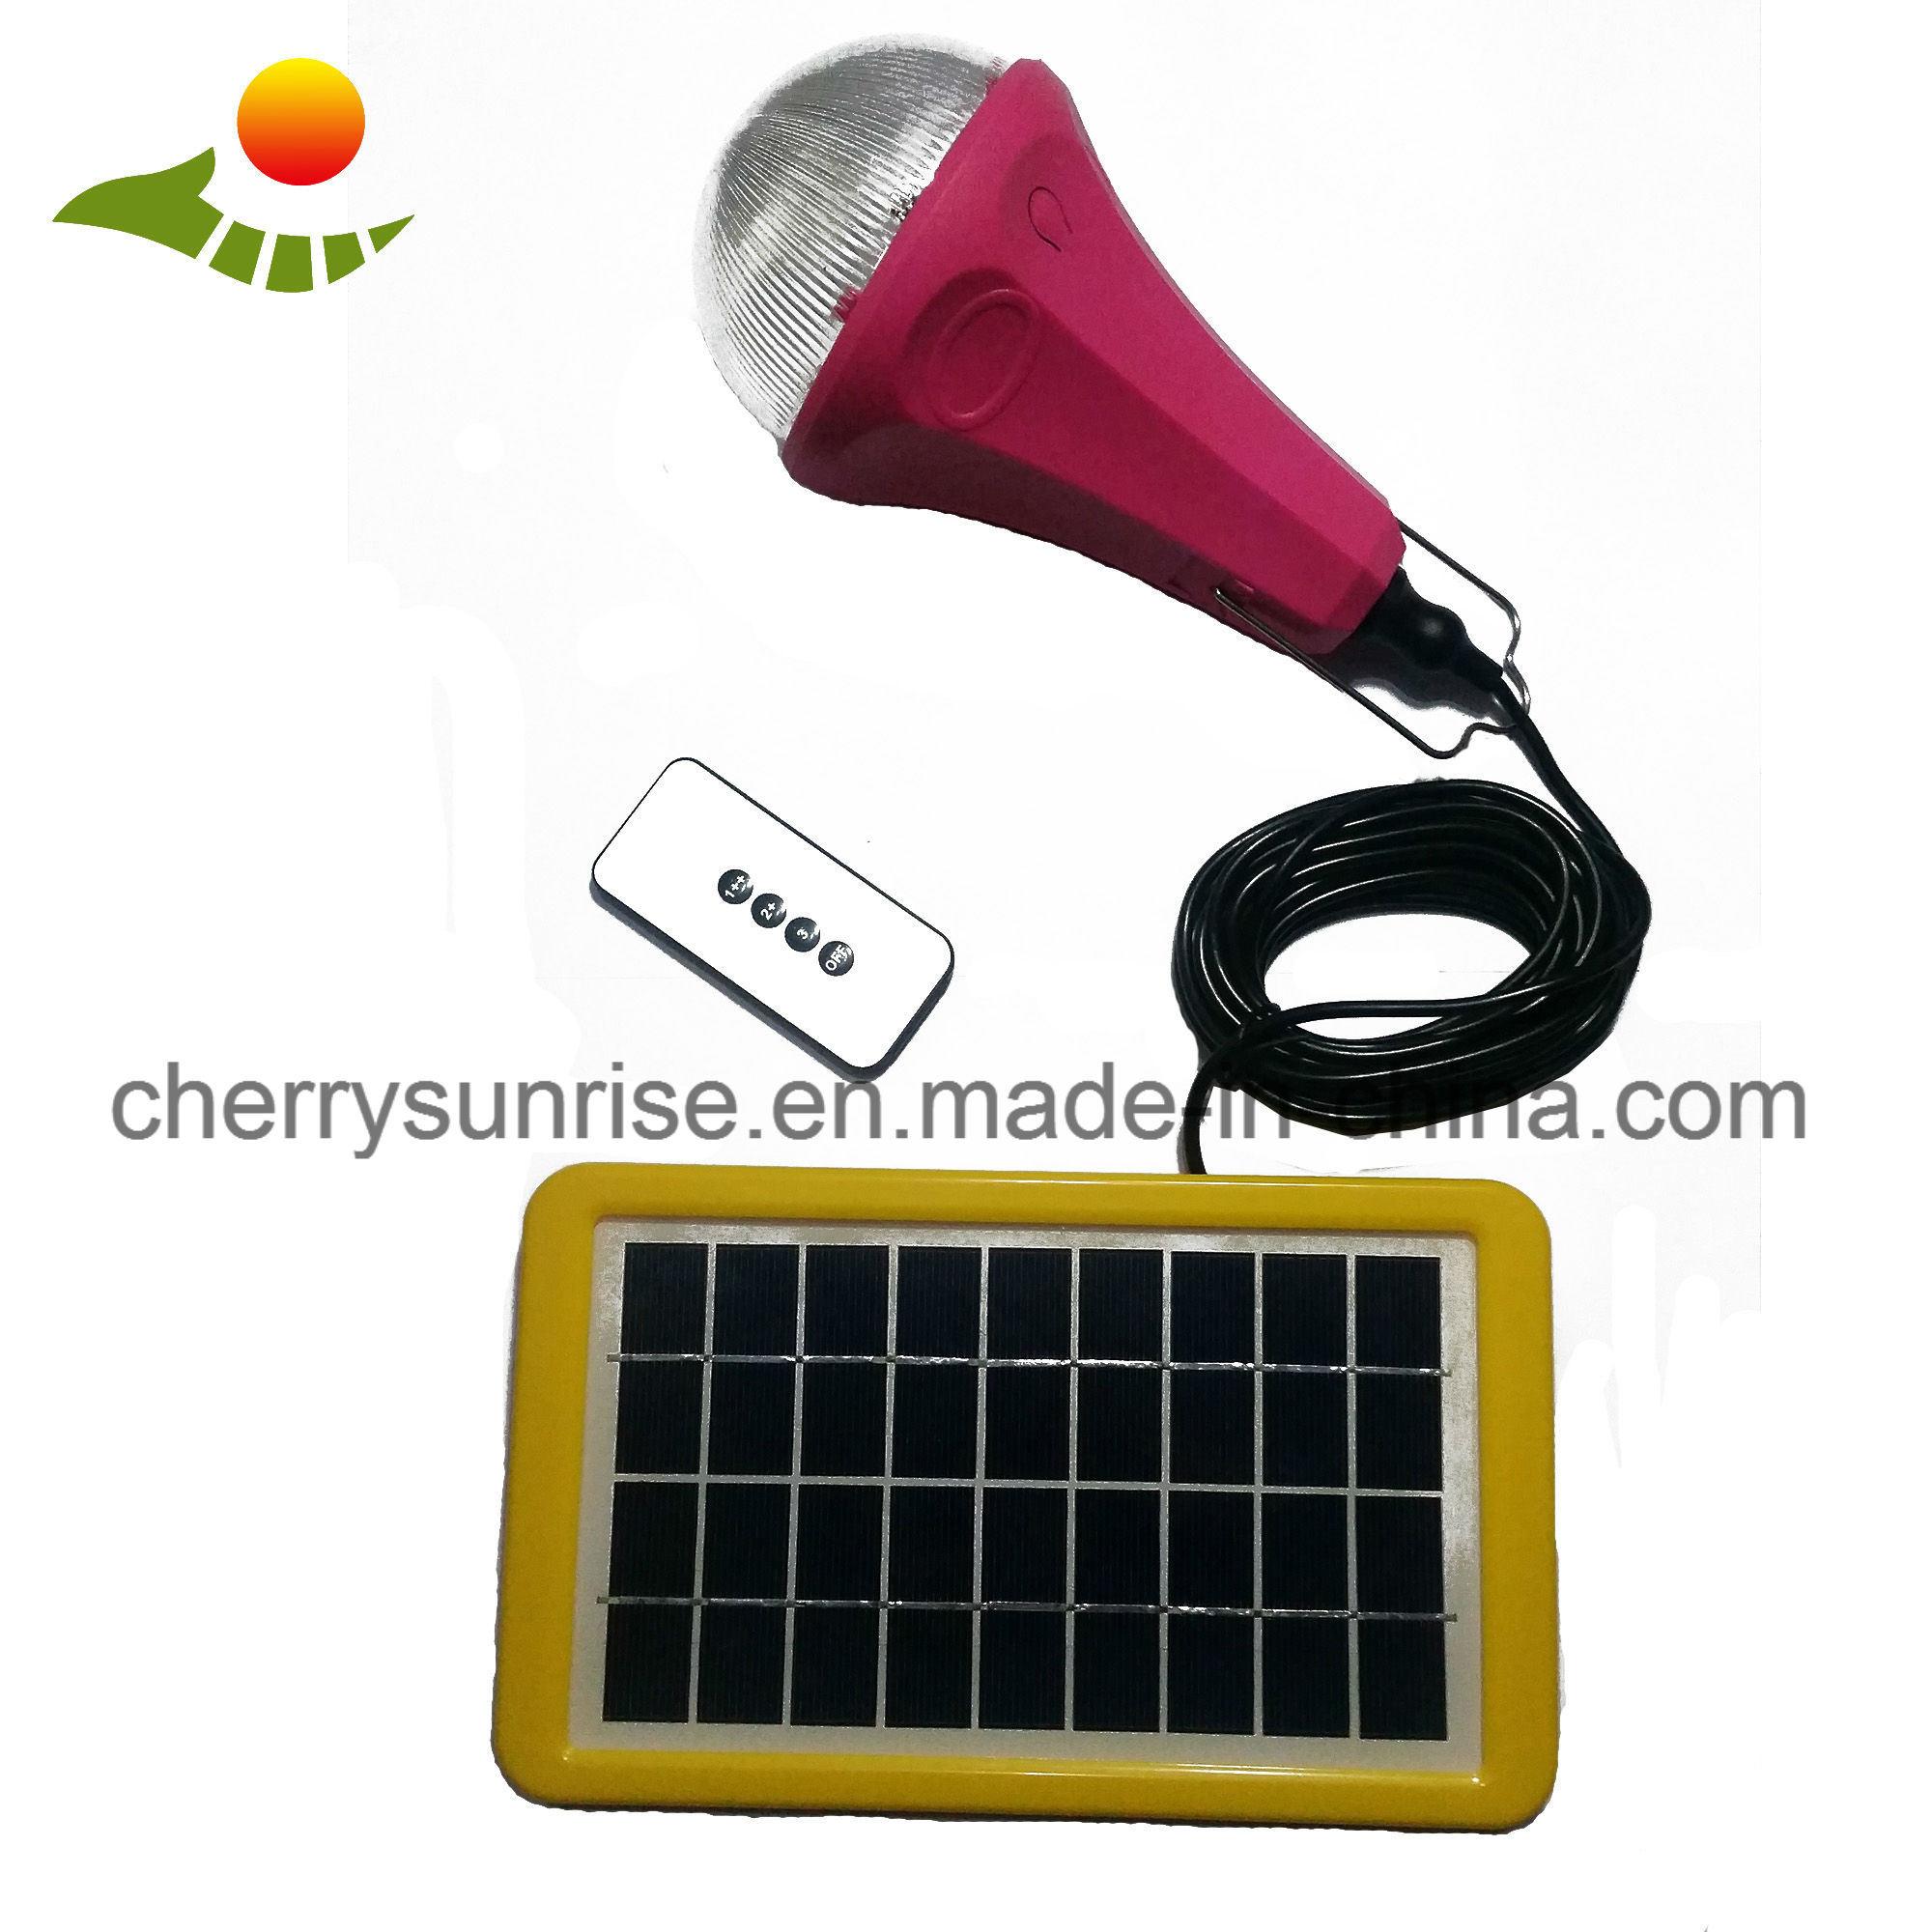 2017 High Quality Portable Lighting Solar Power System Solar Kit